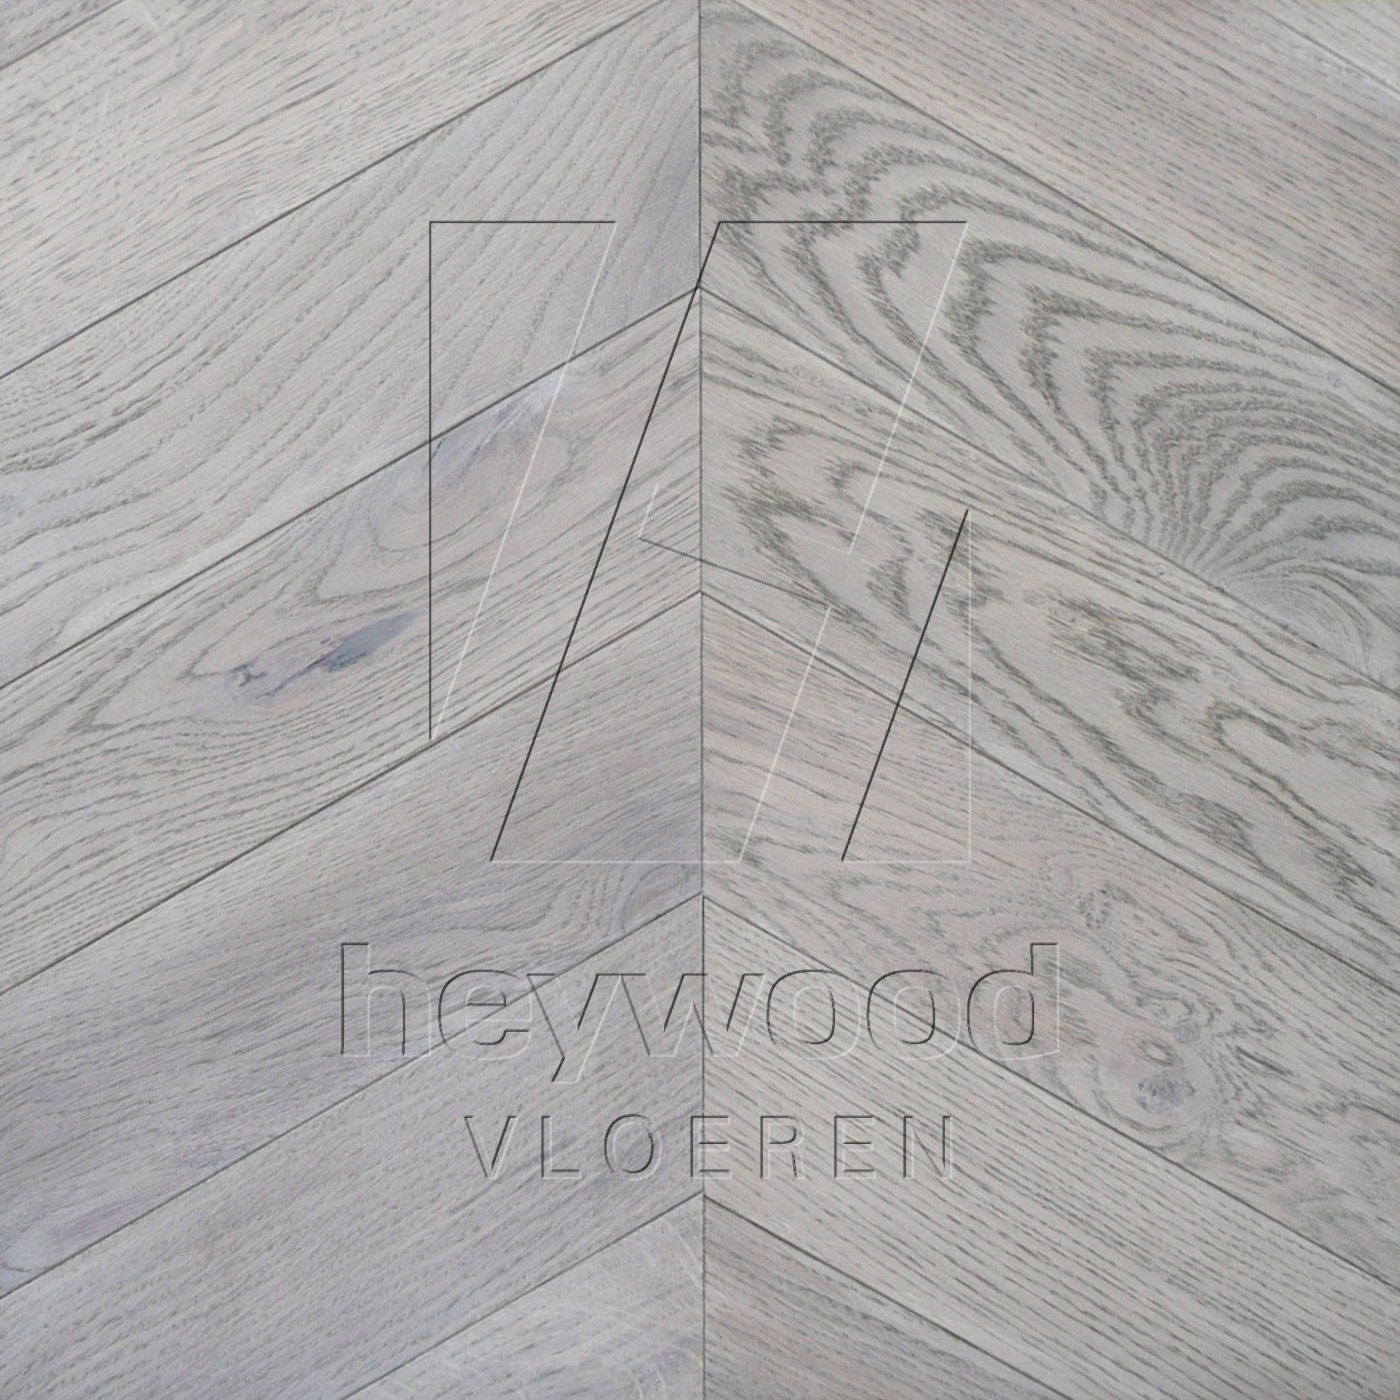 'Chambéry' Chevron 60°, Bespoke Character in Chevron of Pattern & Panel Floors